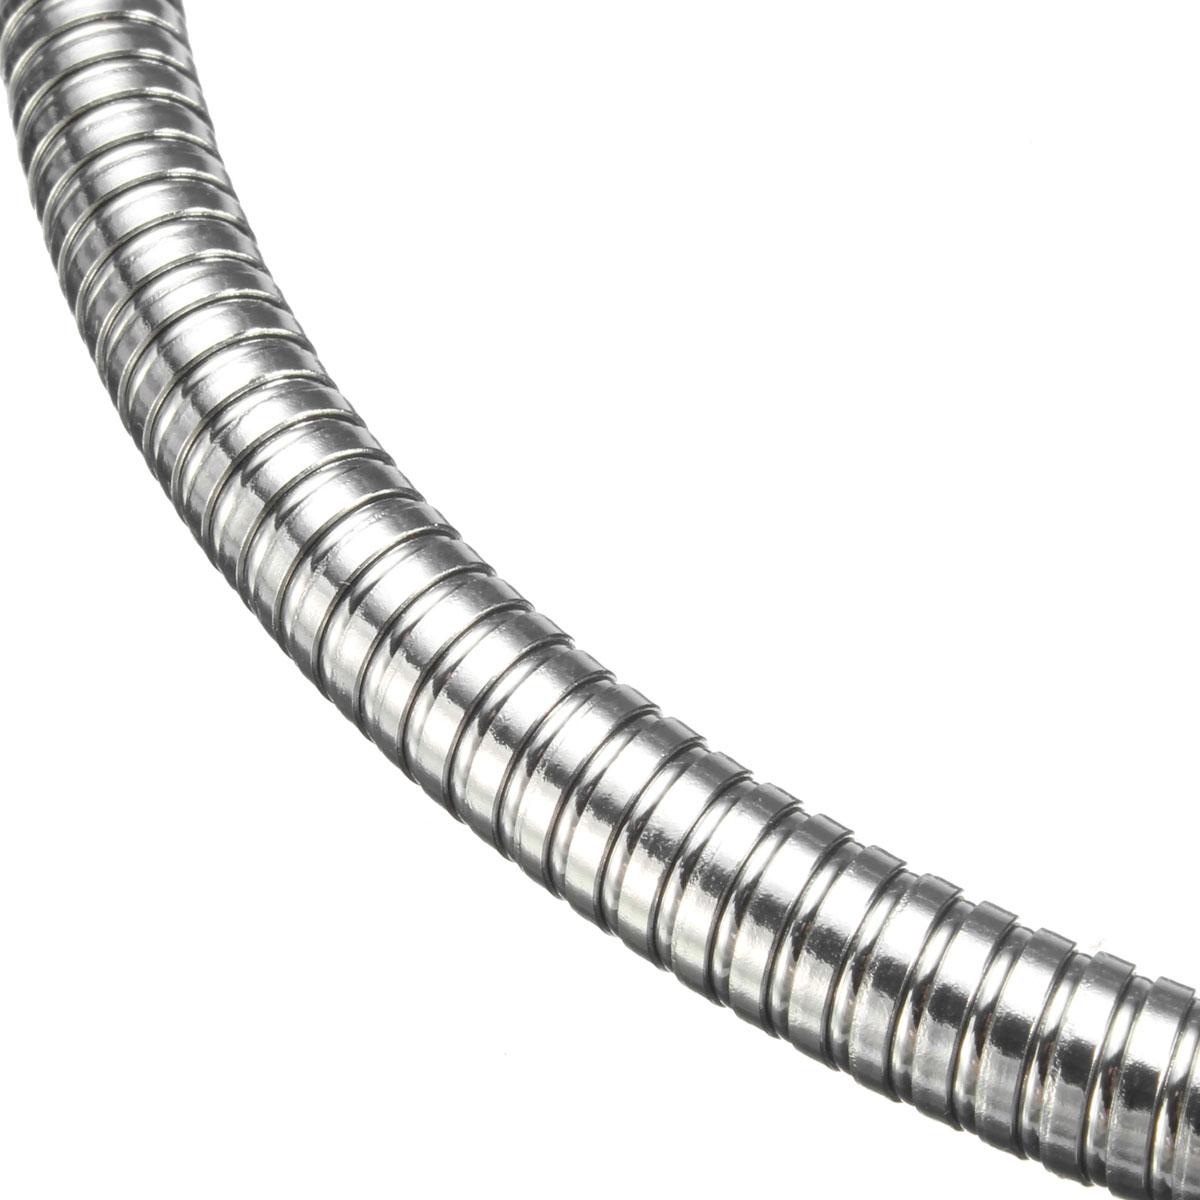 HLD-100 Halogen Refrigerant Gas Leak Detector Leakage